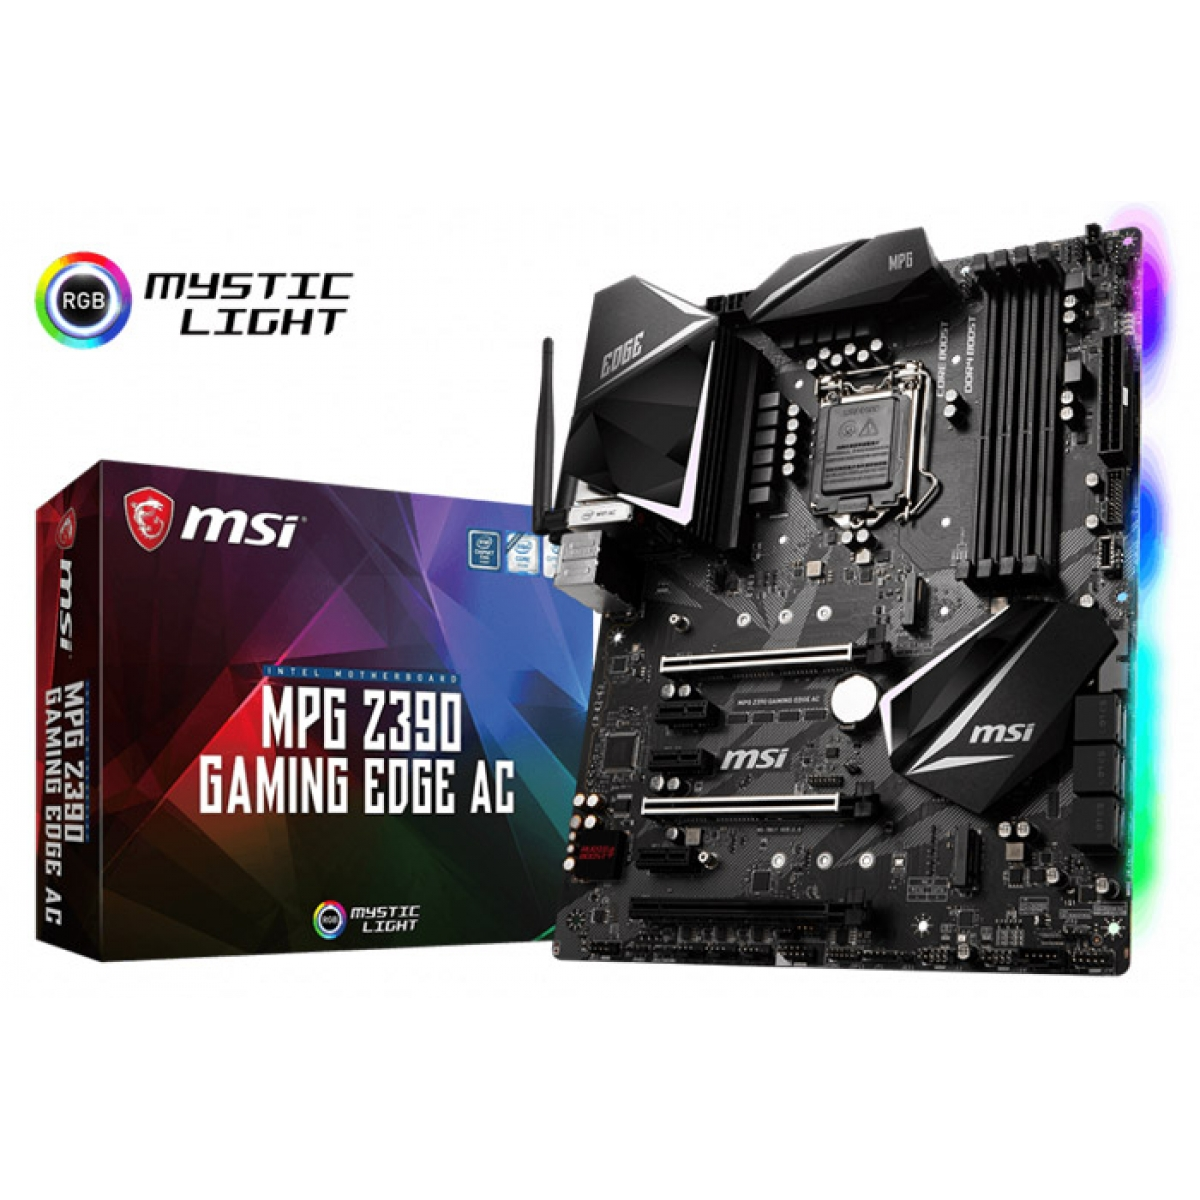 Placa Mãe MSI Z390 Mpg Gaming Edge Ac, Chipset Z390, Intel LGA 1151, ATX, DDR4